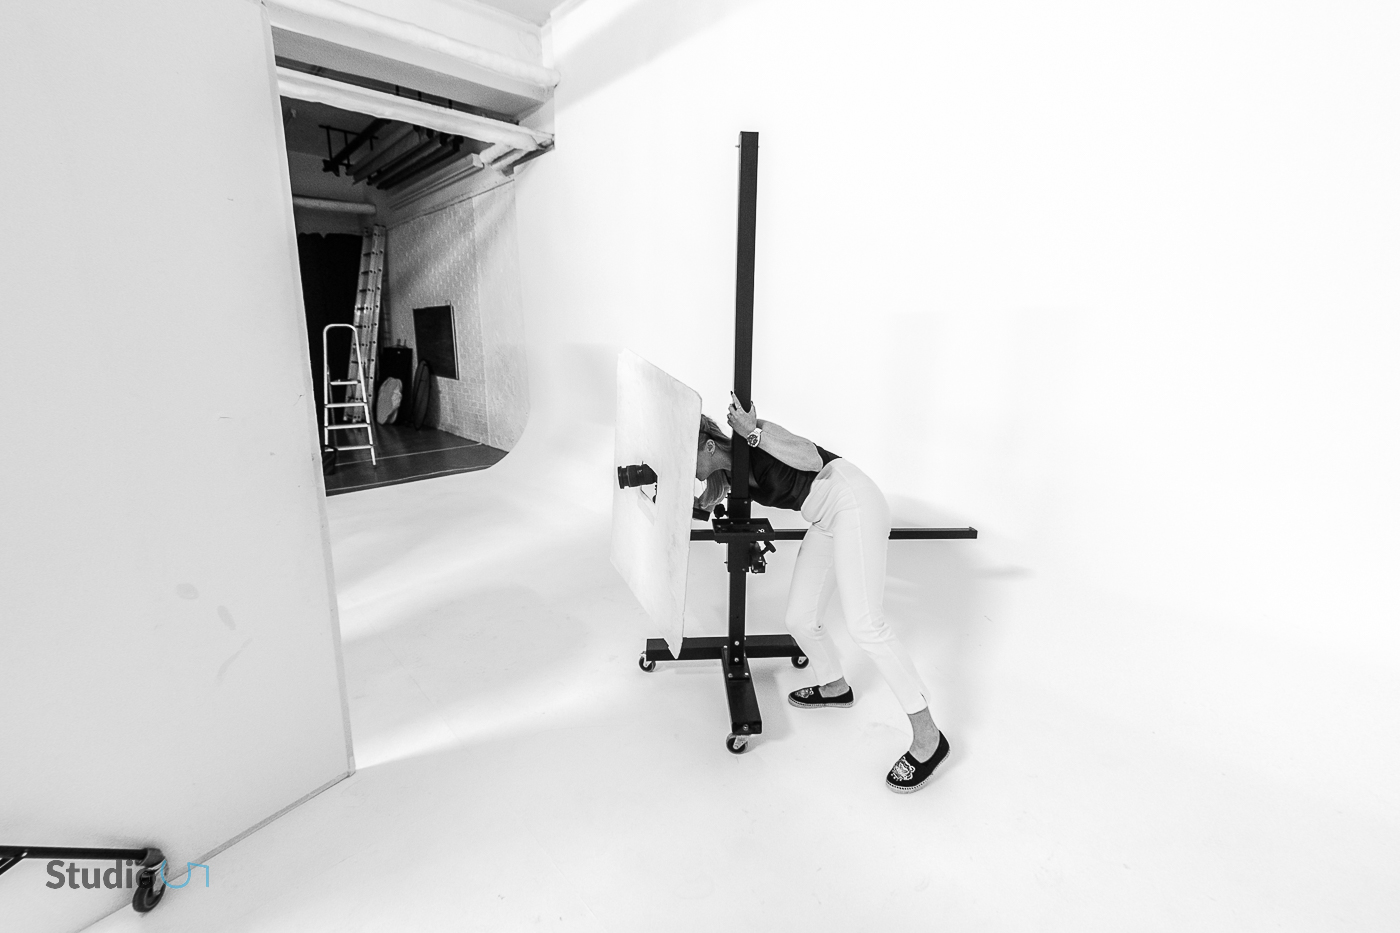 Kula | fotografia obiektu